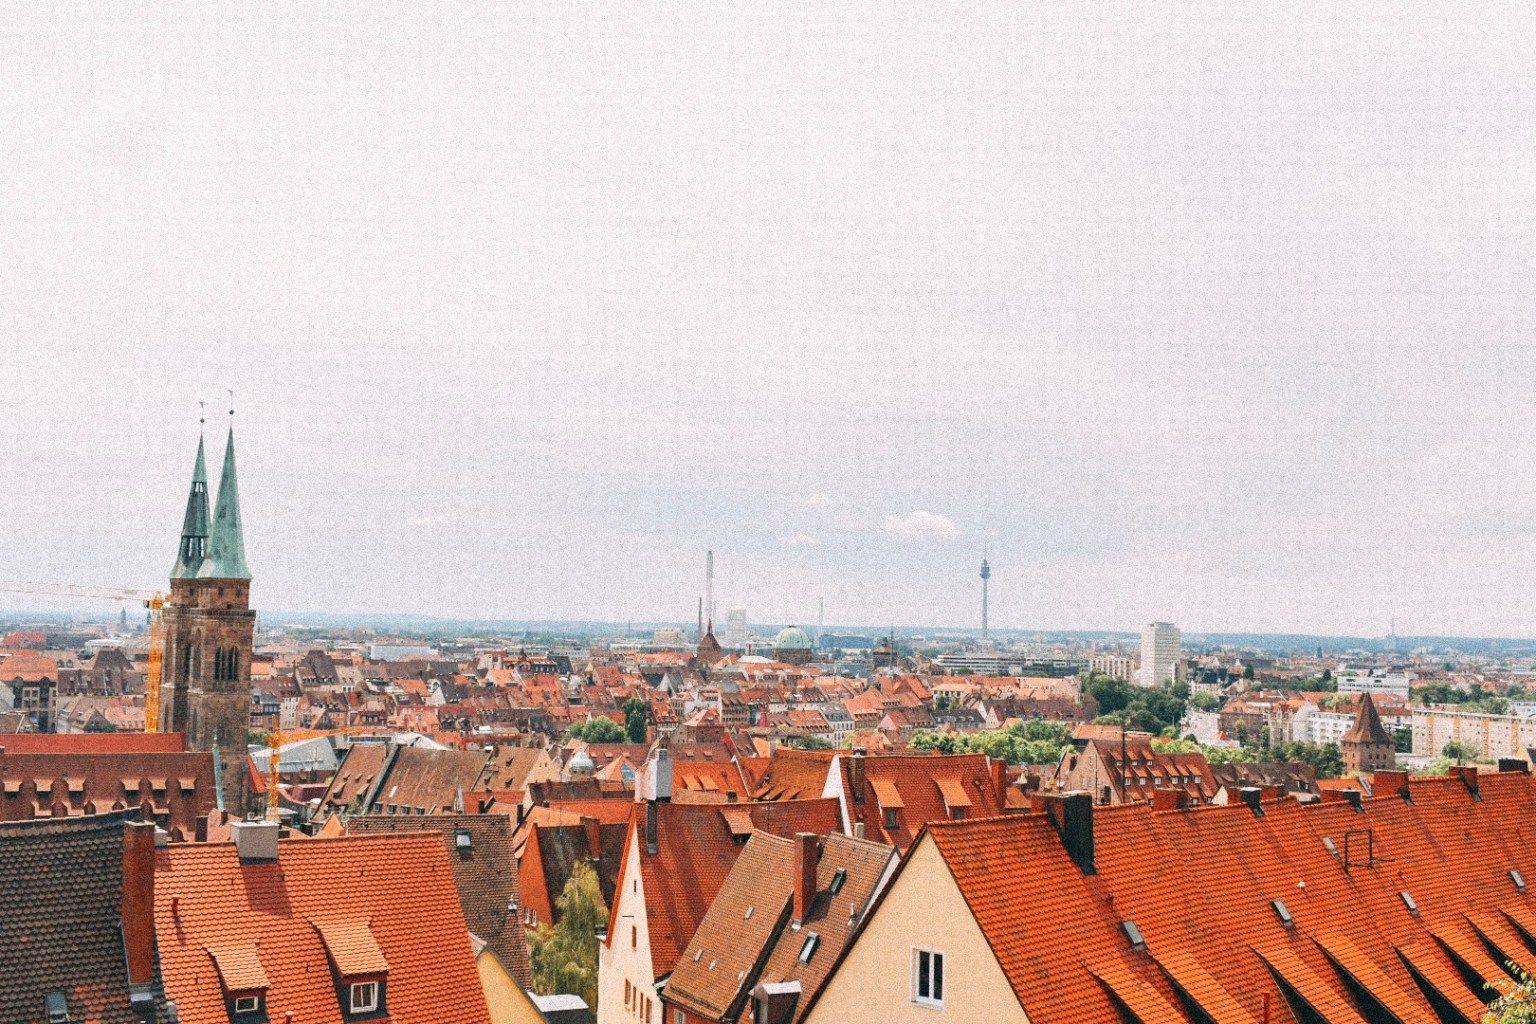 Top things to do in Nuremberg - Emma Adventures